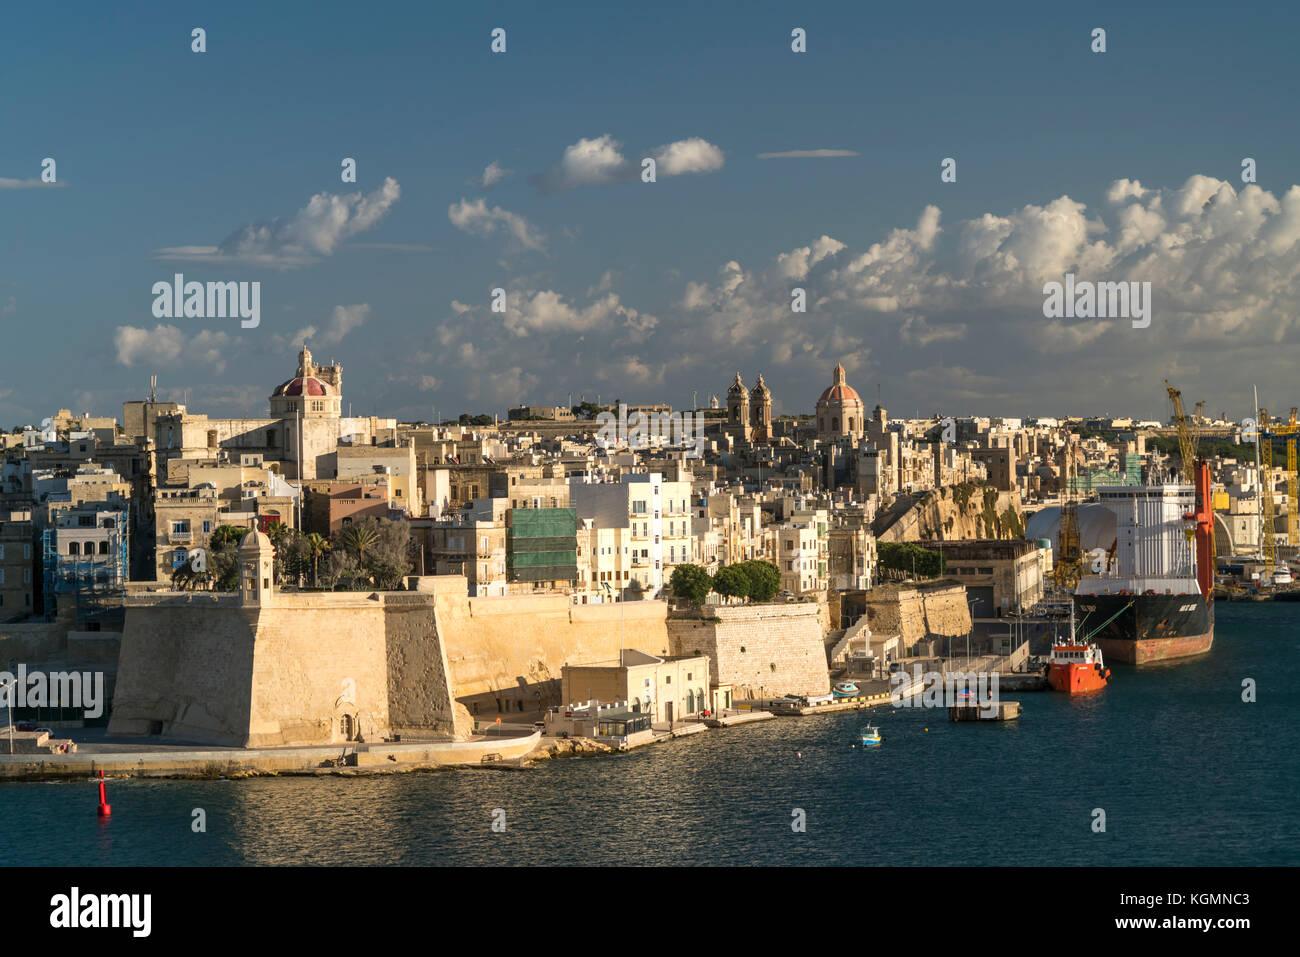 Blick auf Senglea, Valletta, Malta | view over Senglea, Valletta, Malta - Stock Image